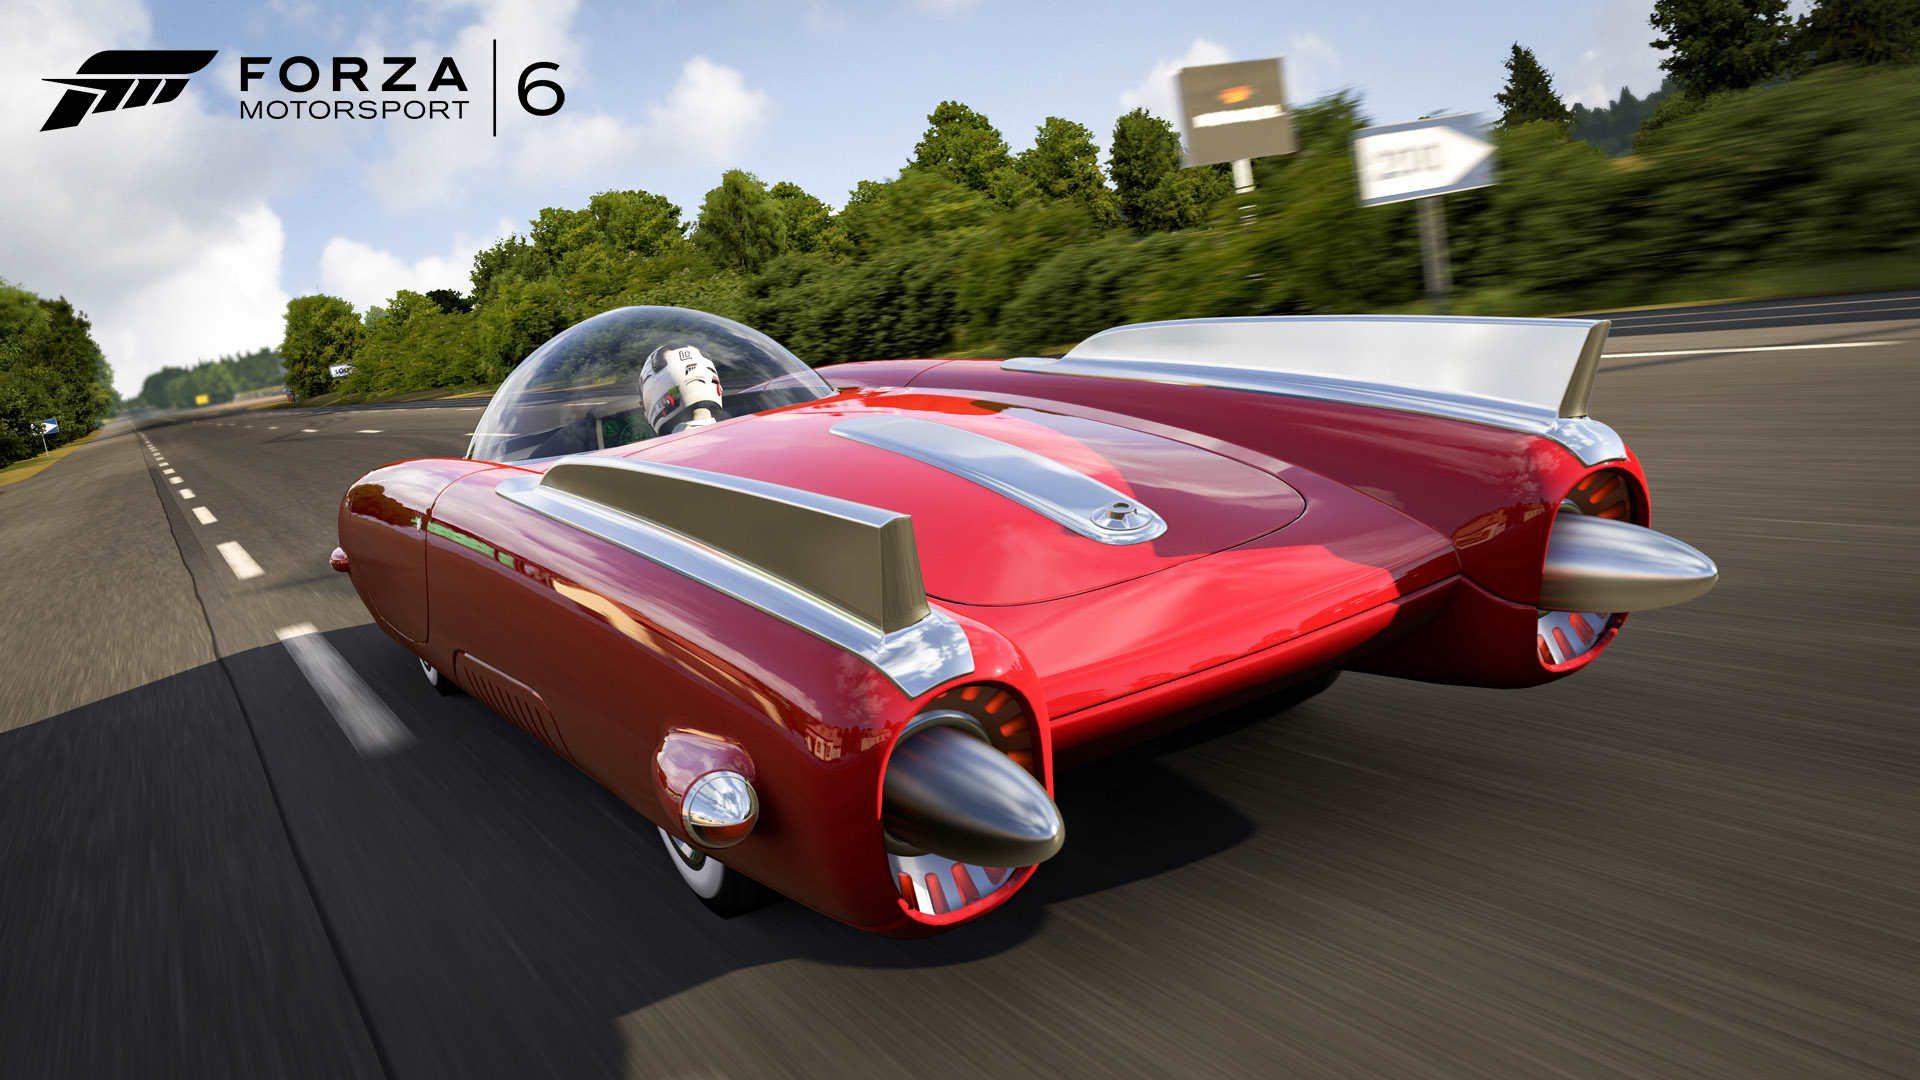 fallout-4-forza-motorsport-6-rocket-gamesoul-2